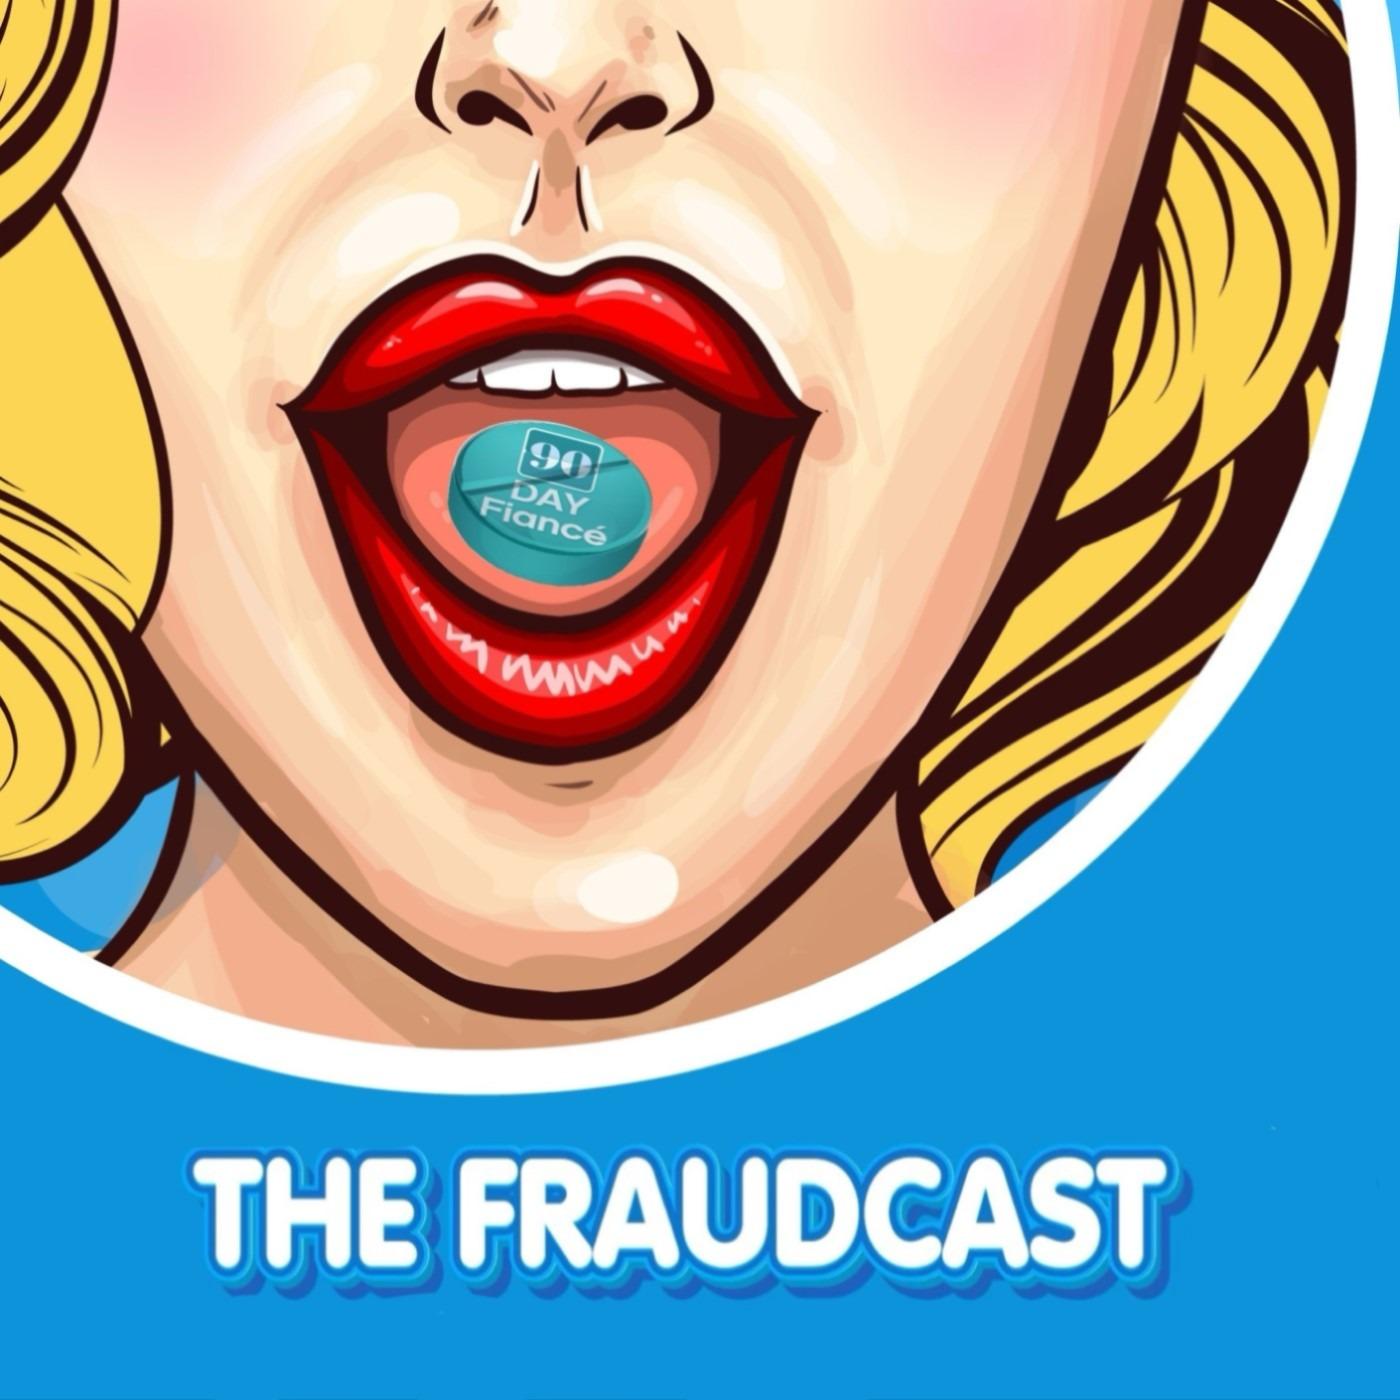 Season 1; Episode 10: Fraudmas Roundup